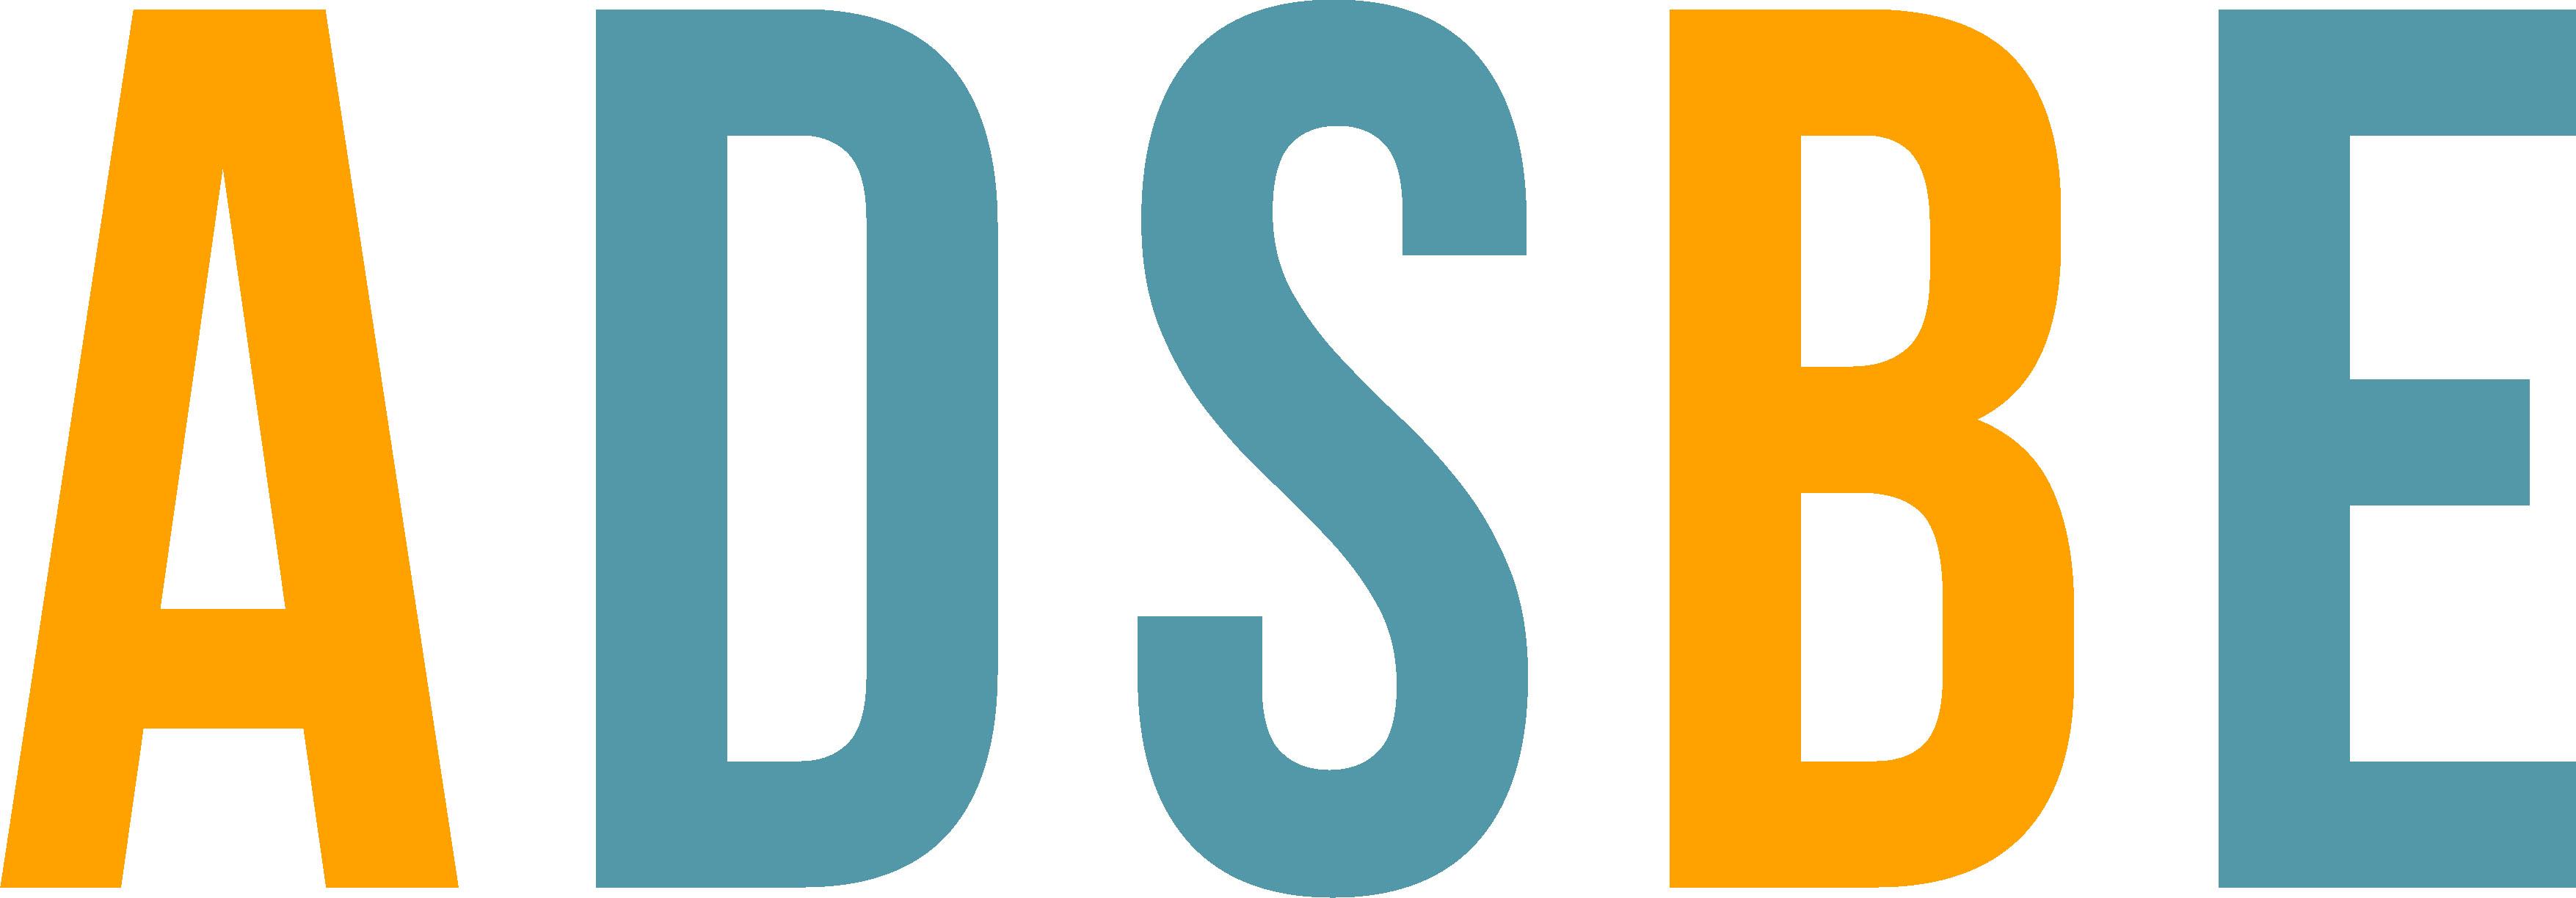 Разработка логотипа для CPA-сети фото f_145587ba5df5ce59.jpg